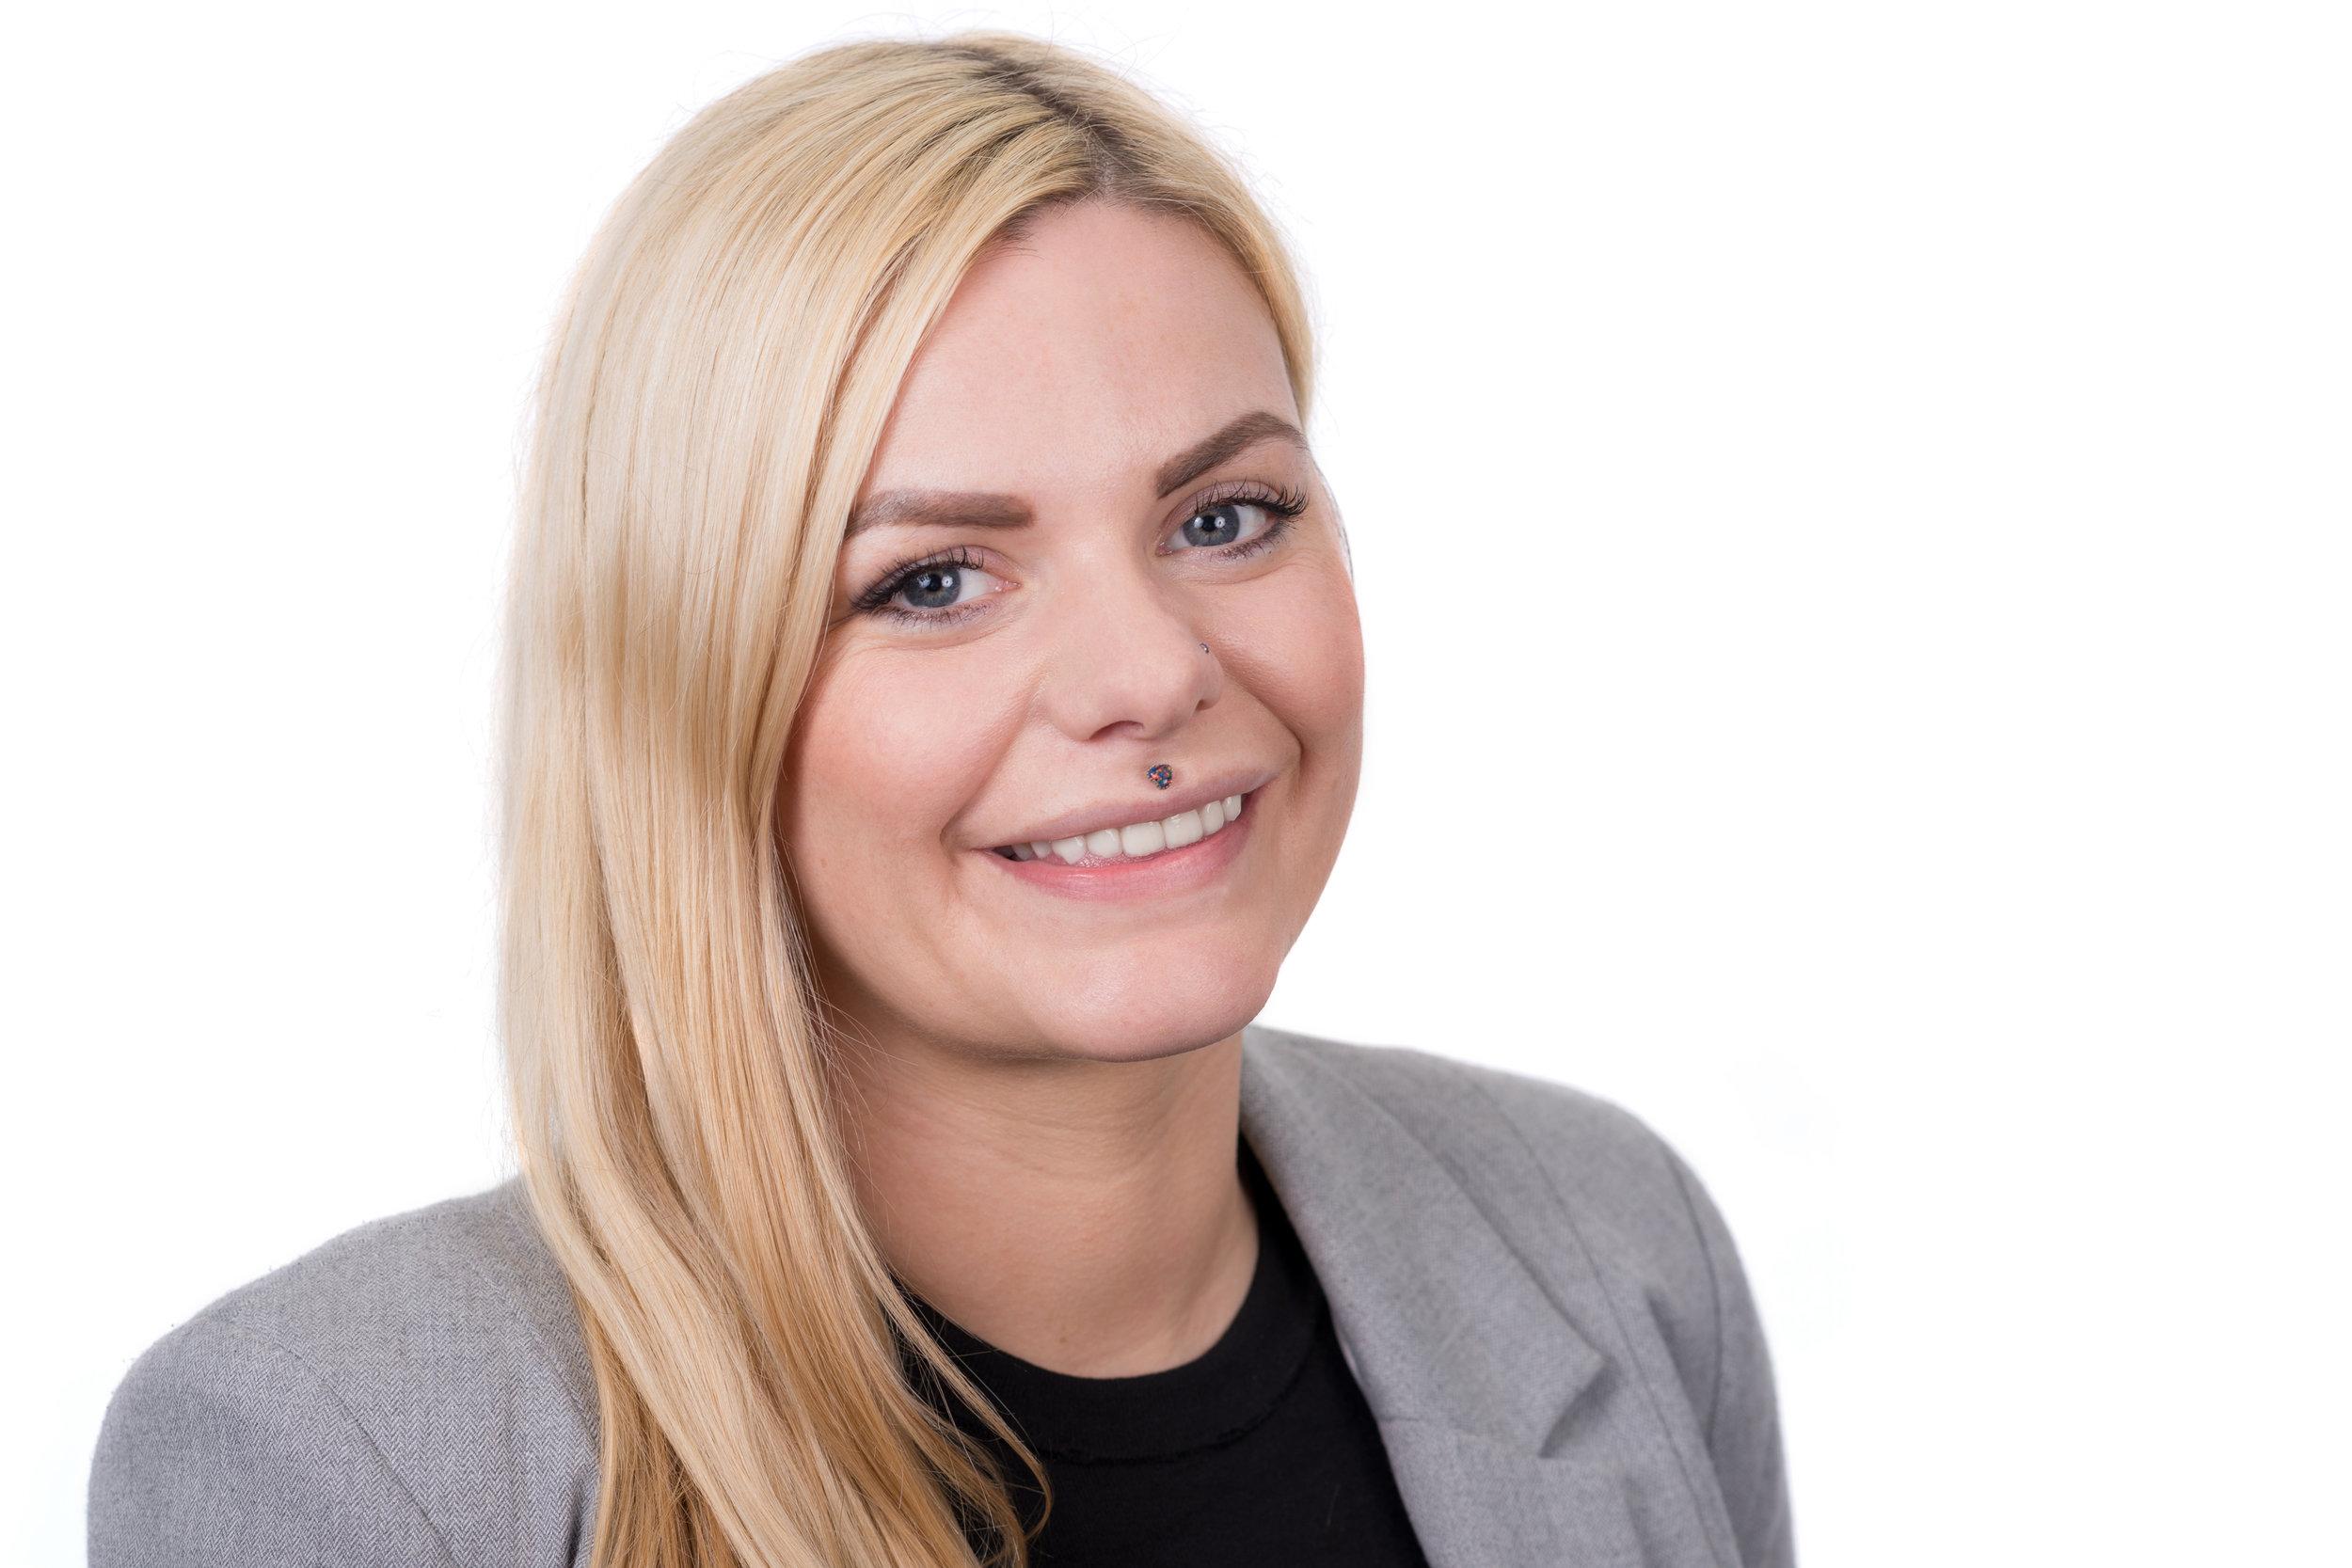 Blonde Businesswoman Headshot Photo Wearing Light Jacket